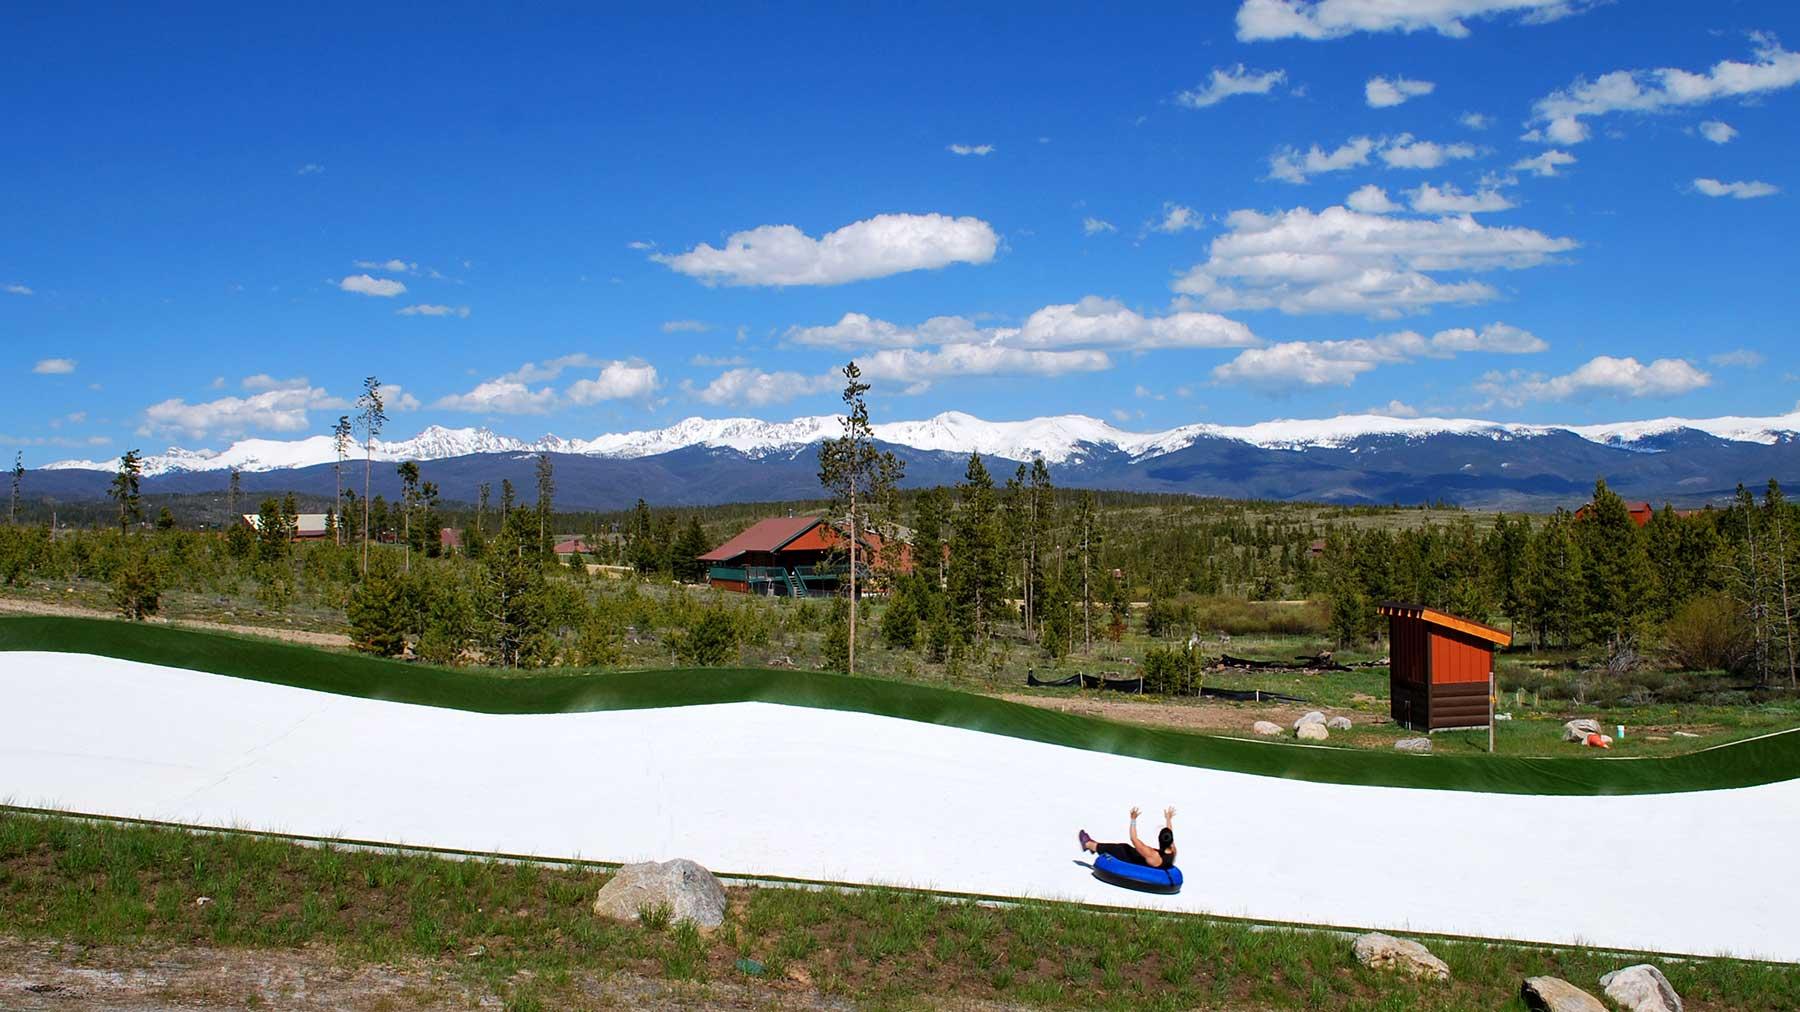 YMCA of the Rockies Snowflex Tubing